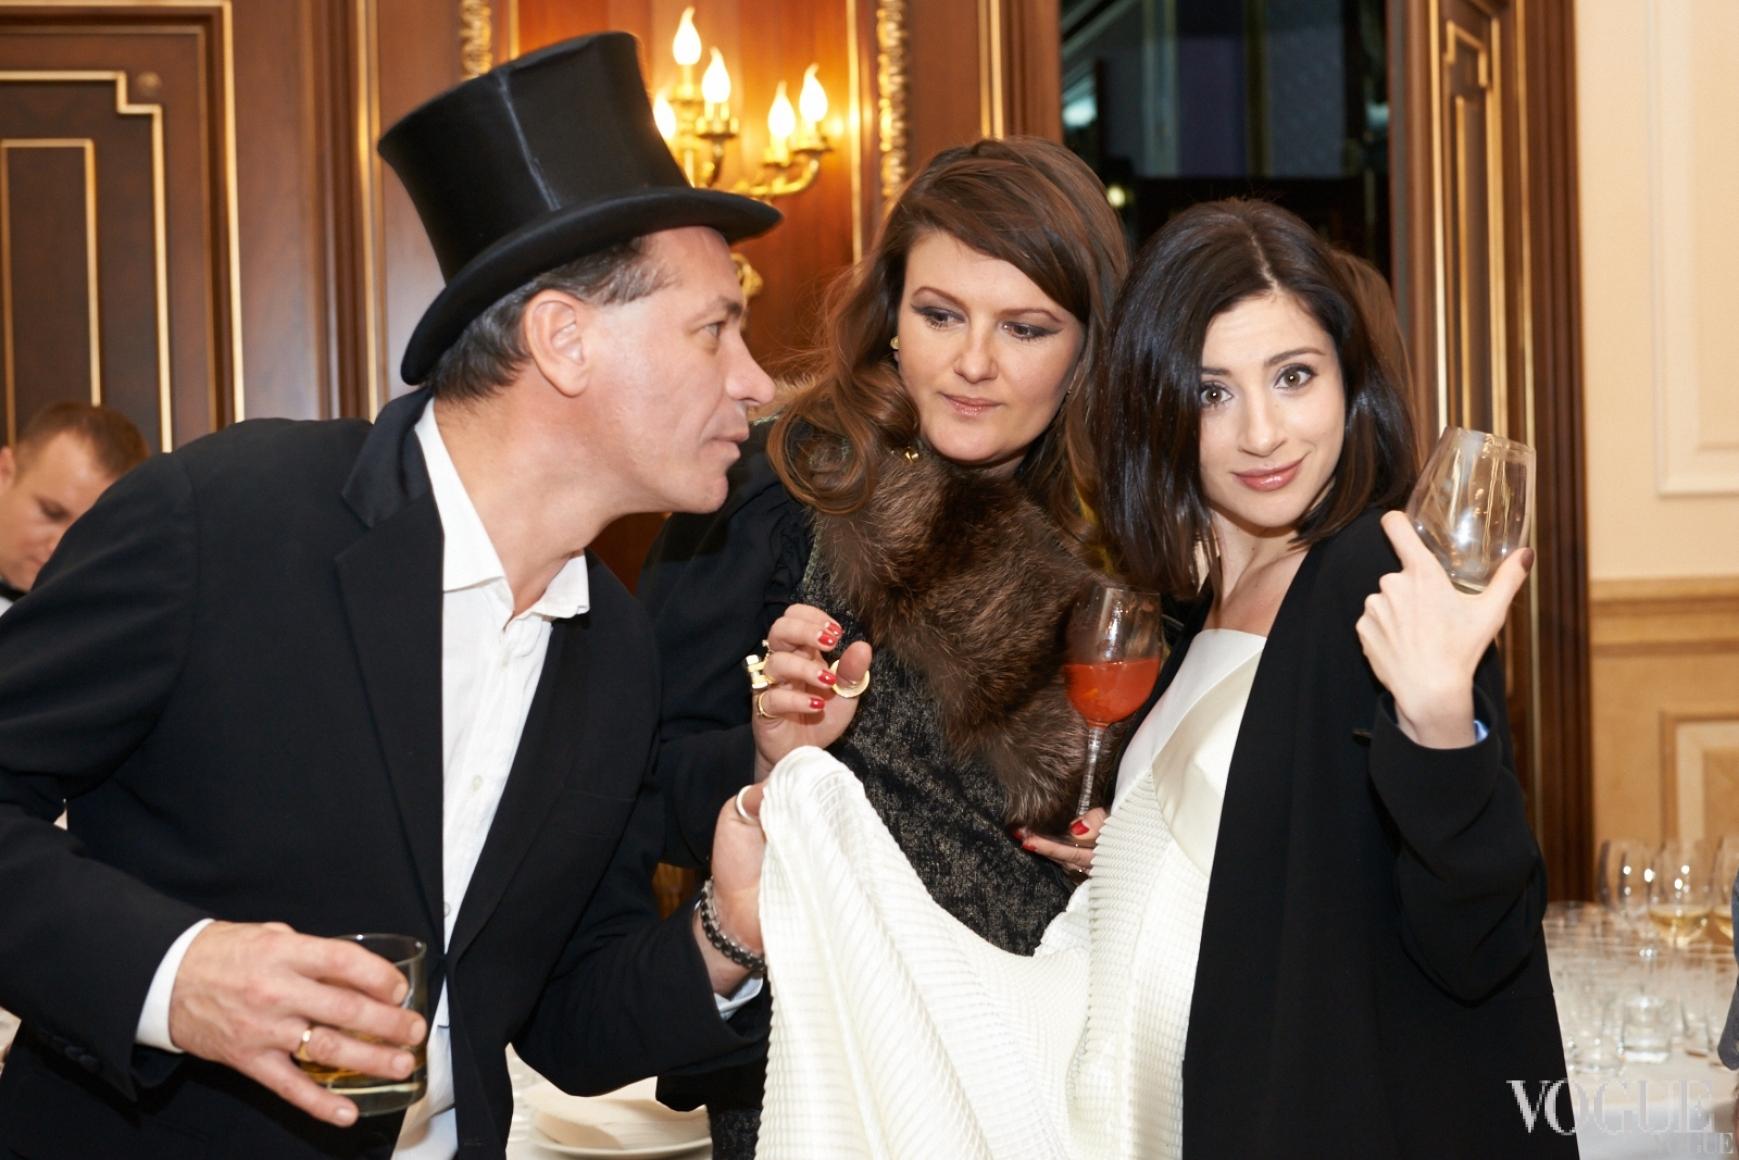 Илья Чичкан, Маша Шубина и Светлана Бевза